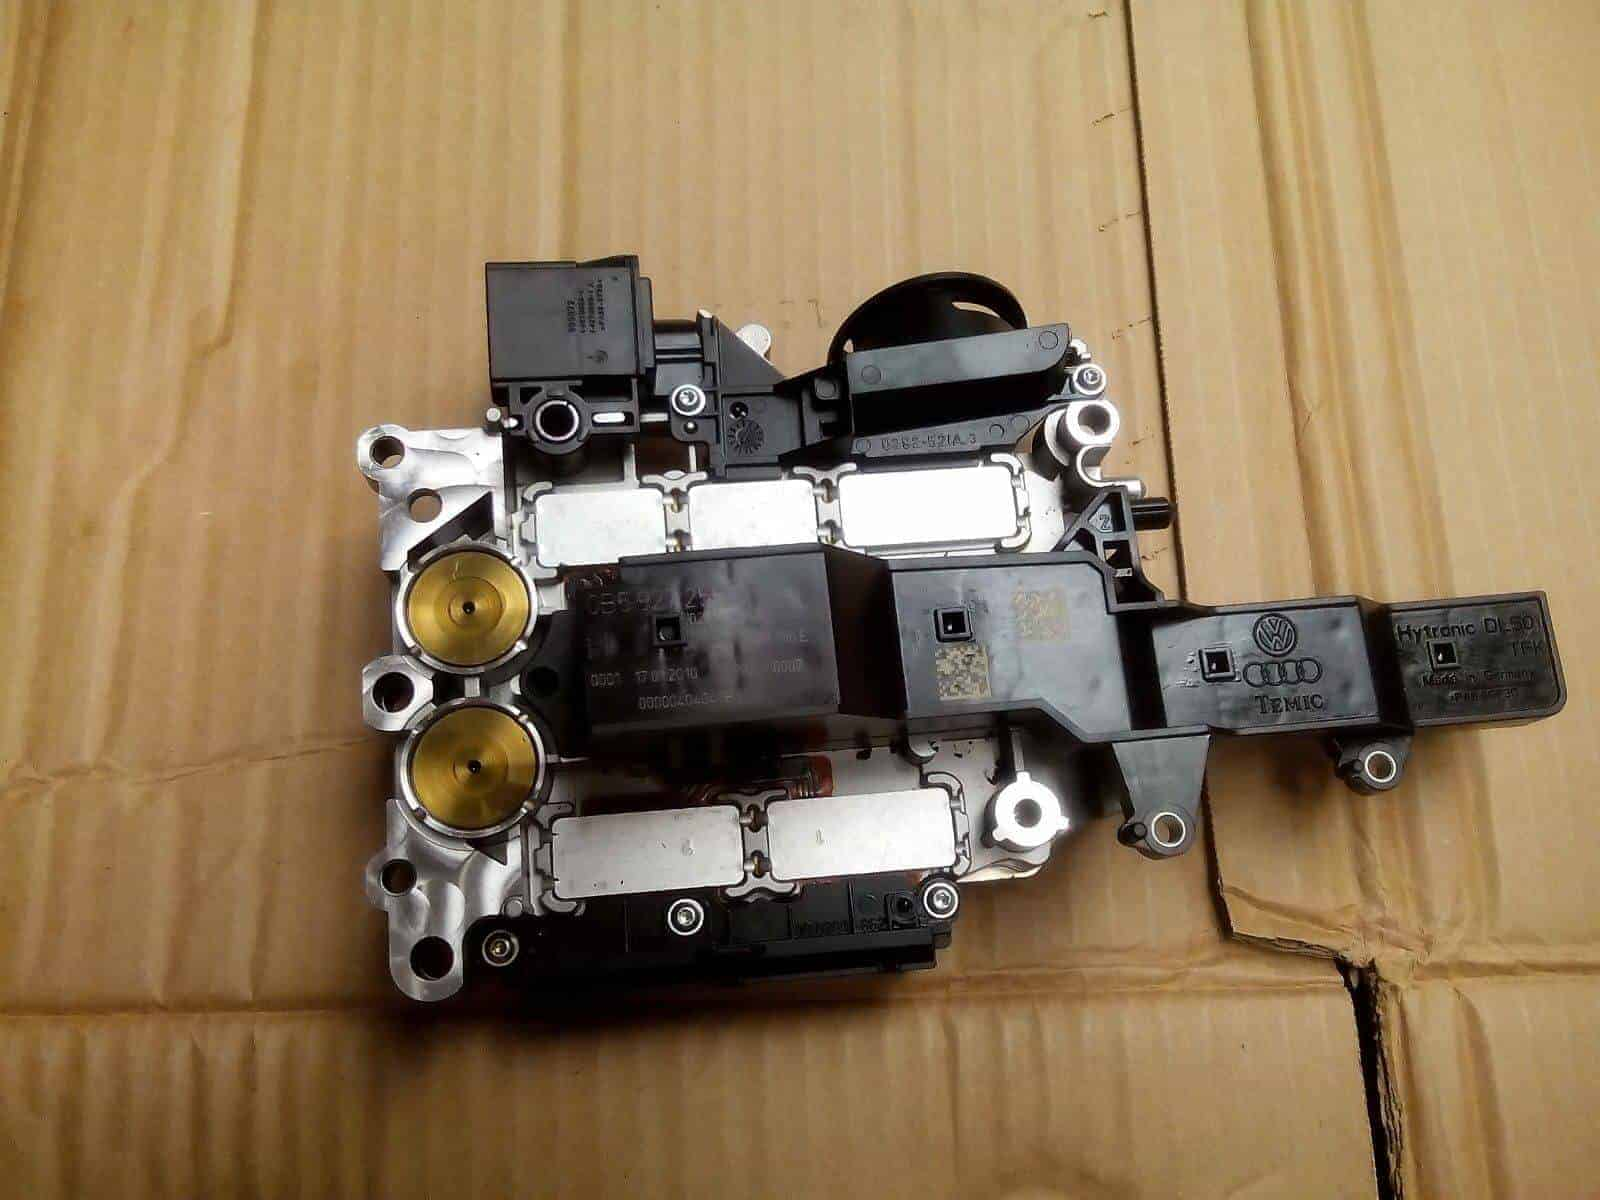 0B5927156E 0B5 DL501 TCU TCM 7 Speed WD Clutch Automatic Transmission  Control Unit For Audi A4